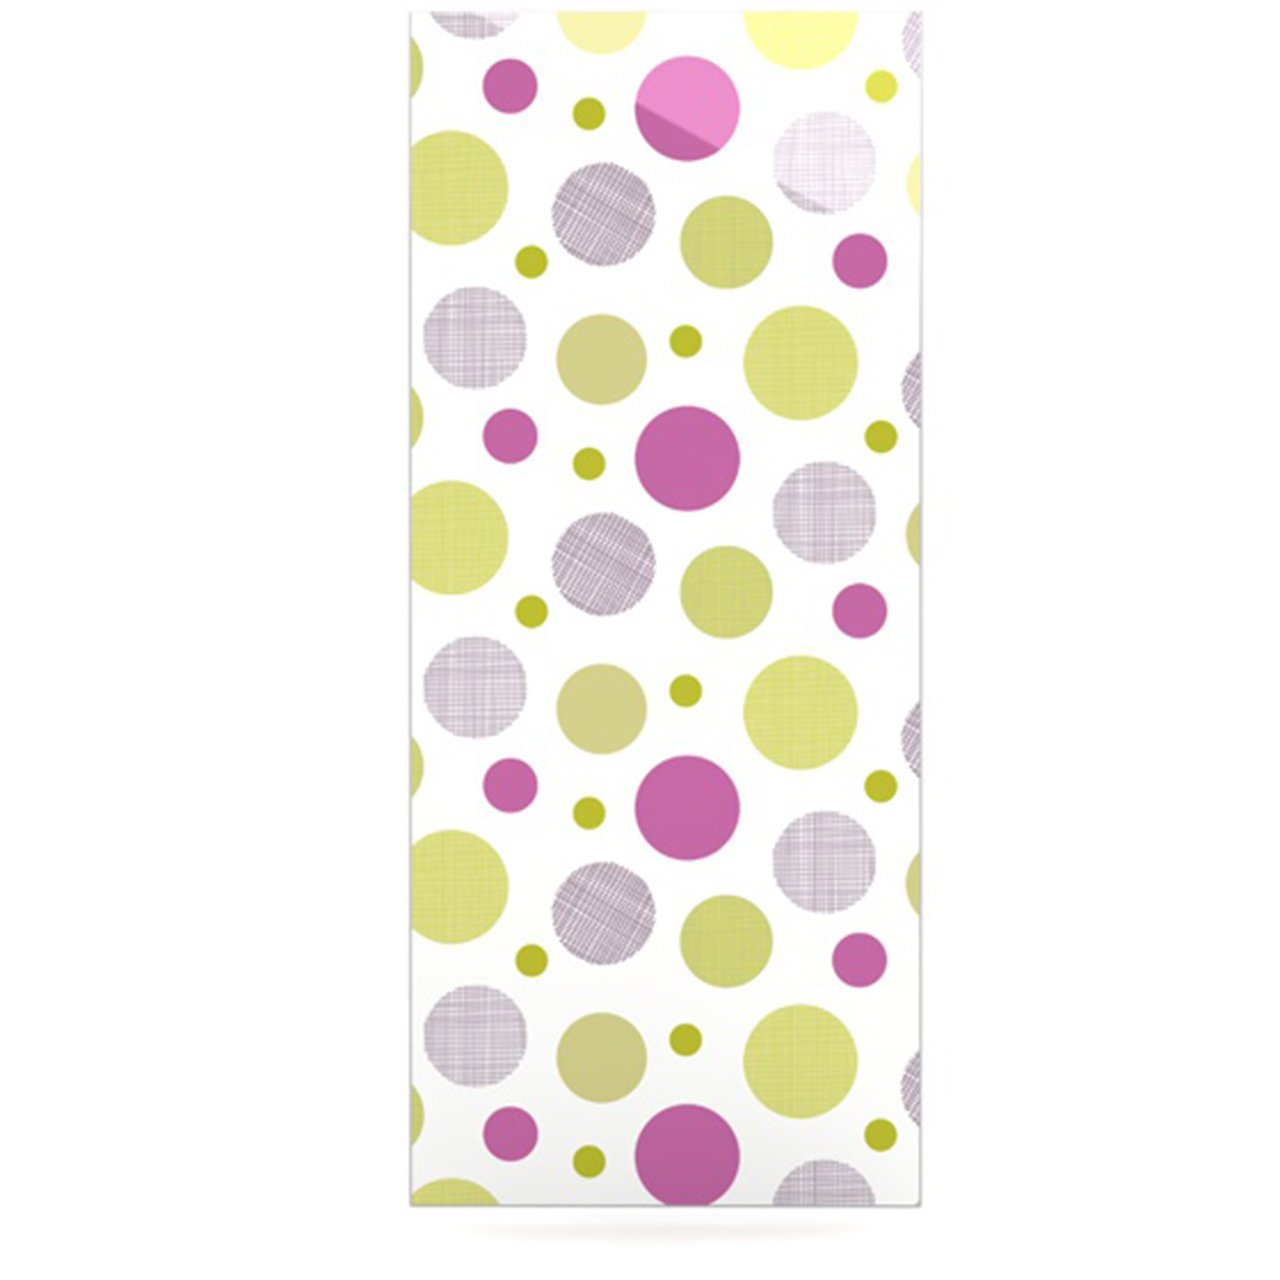 24 x 36 Kess InHouse Julie Hamilton Rhapsody Dot Pink Yellow Luxe Rectangle Panel